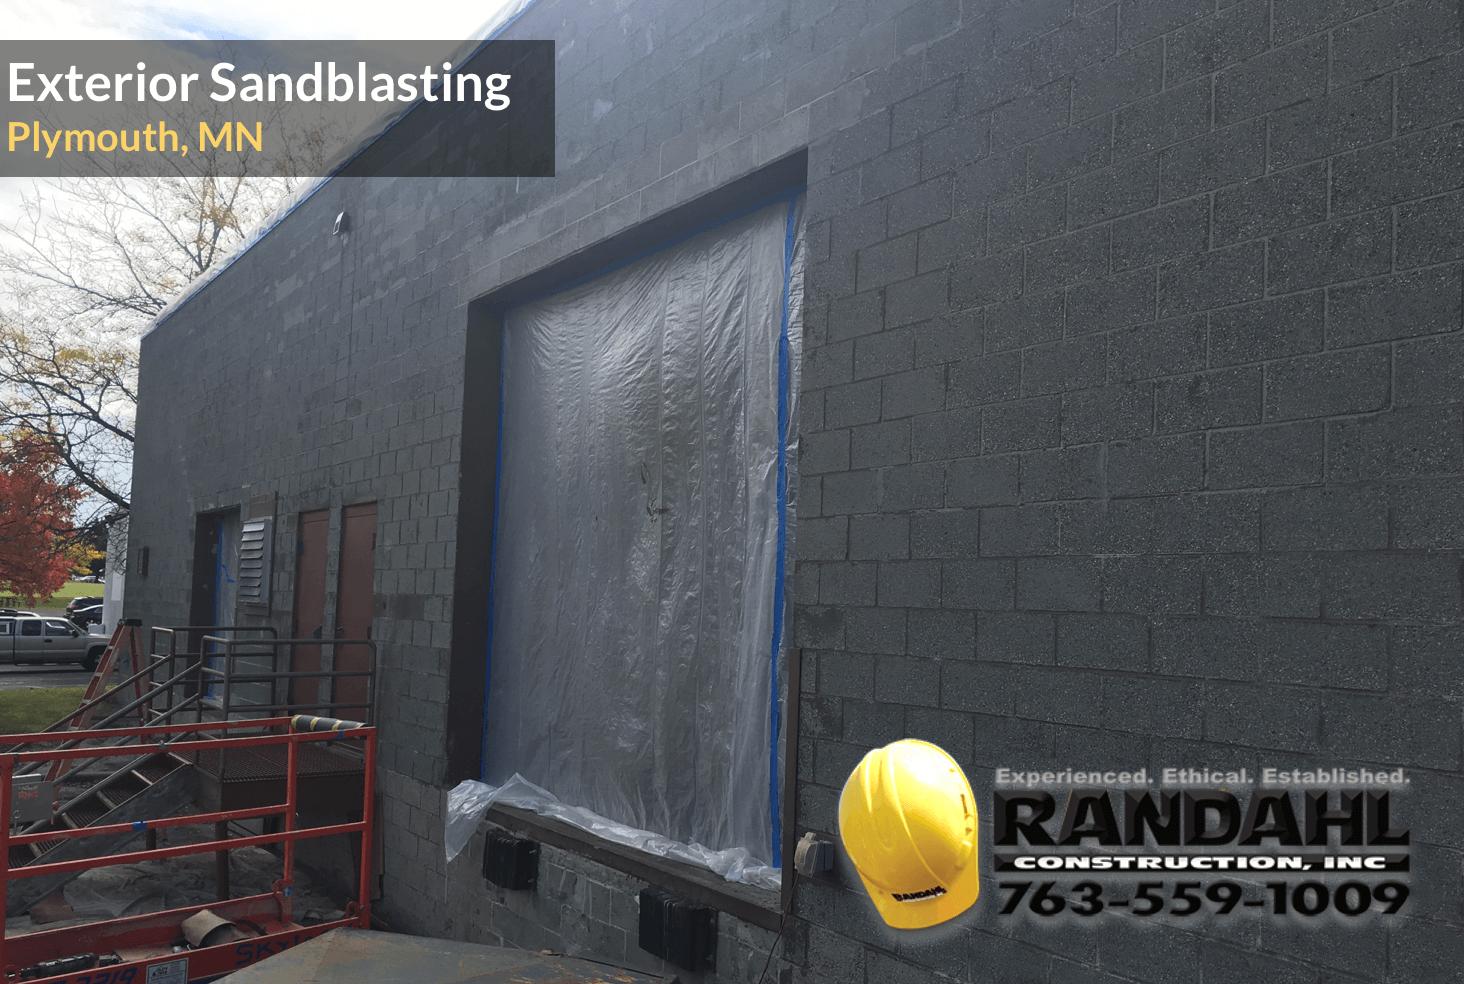 exterior sandblasting contractor